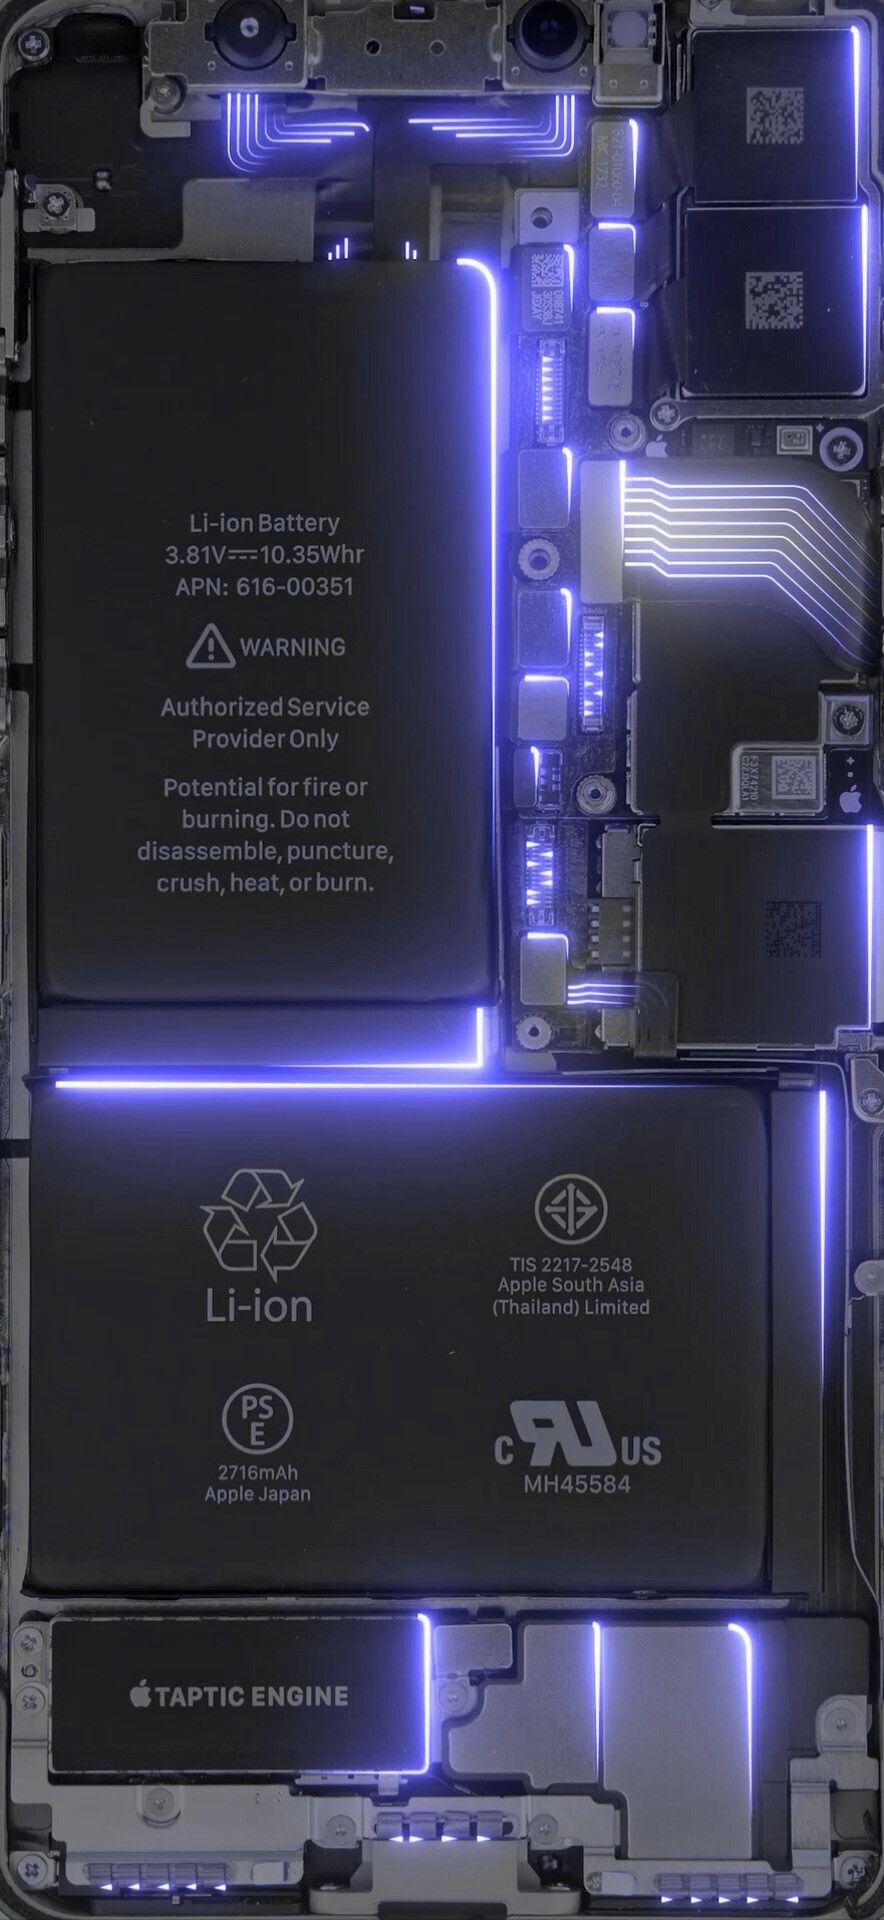 Pin Oleh Danil Revuckij Di Apple Wallpaper Wallpaper Ponsel Teknologi Latar Belakang